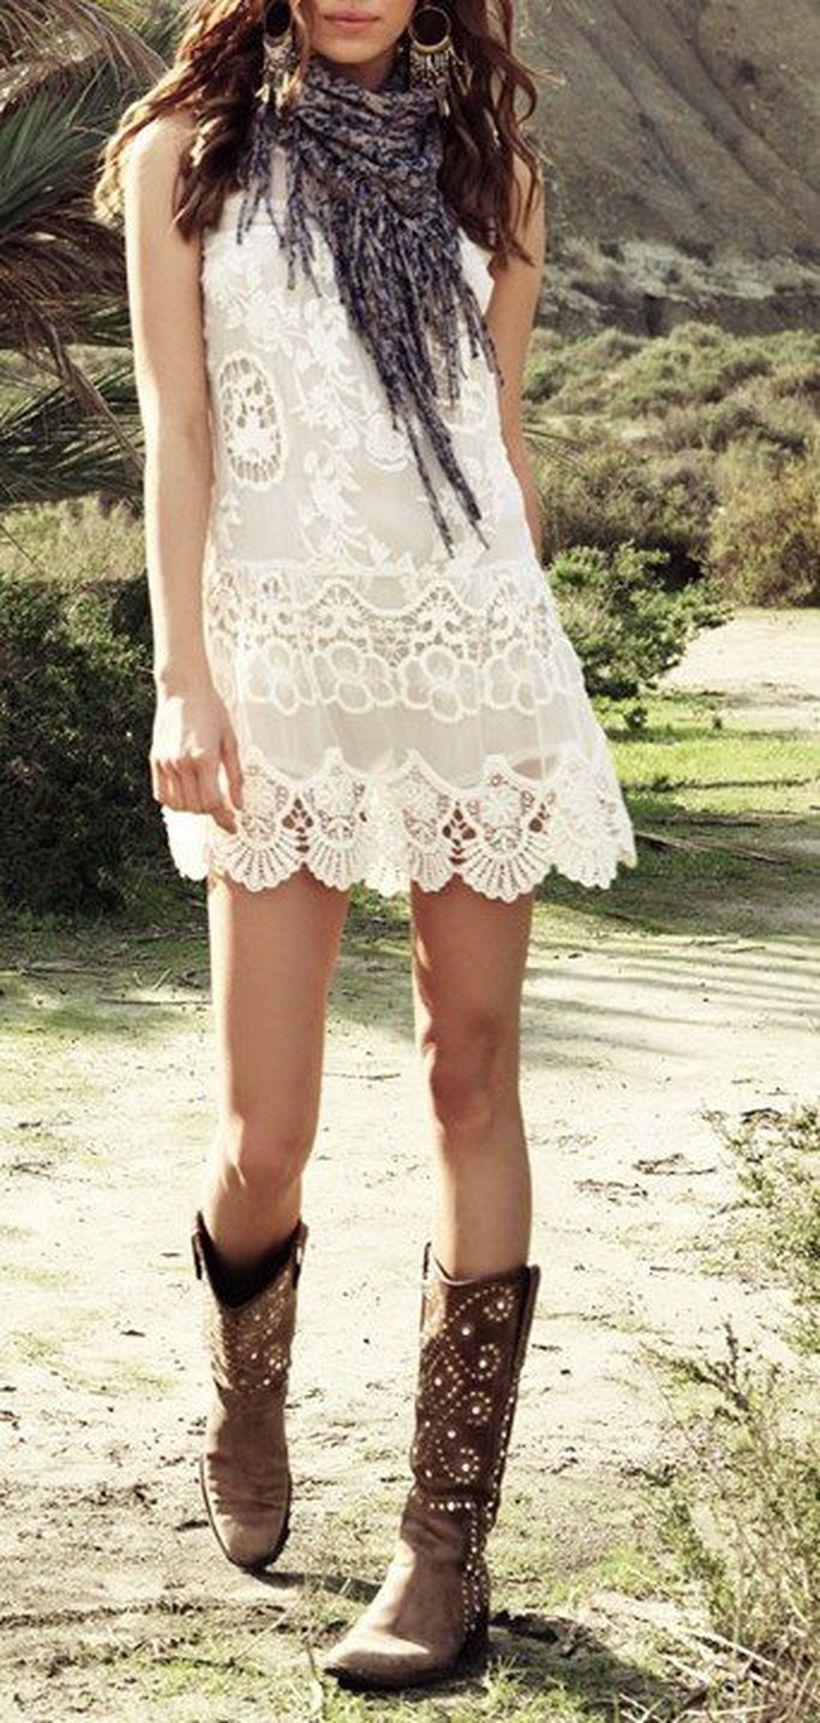 120 Stylish Casual Bohemian Boho Chic Outfits Style Ideas | Chic ...